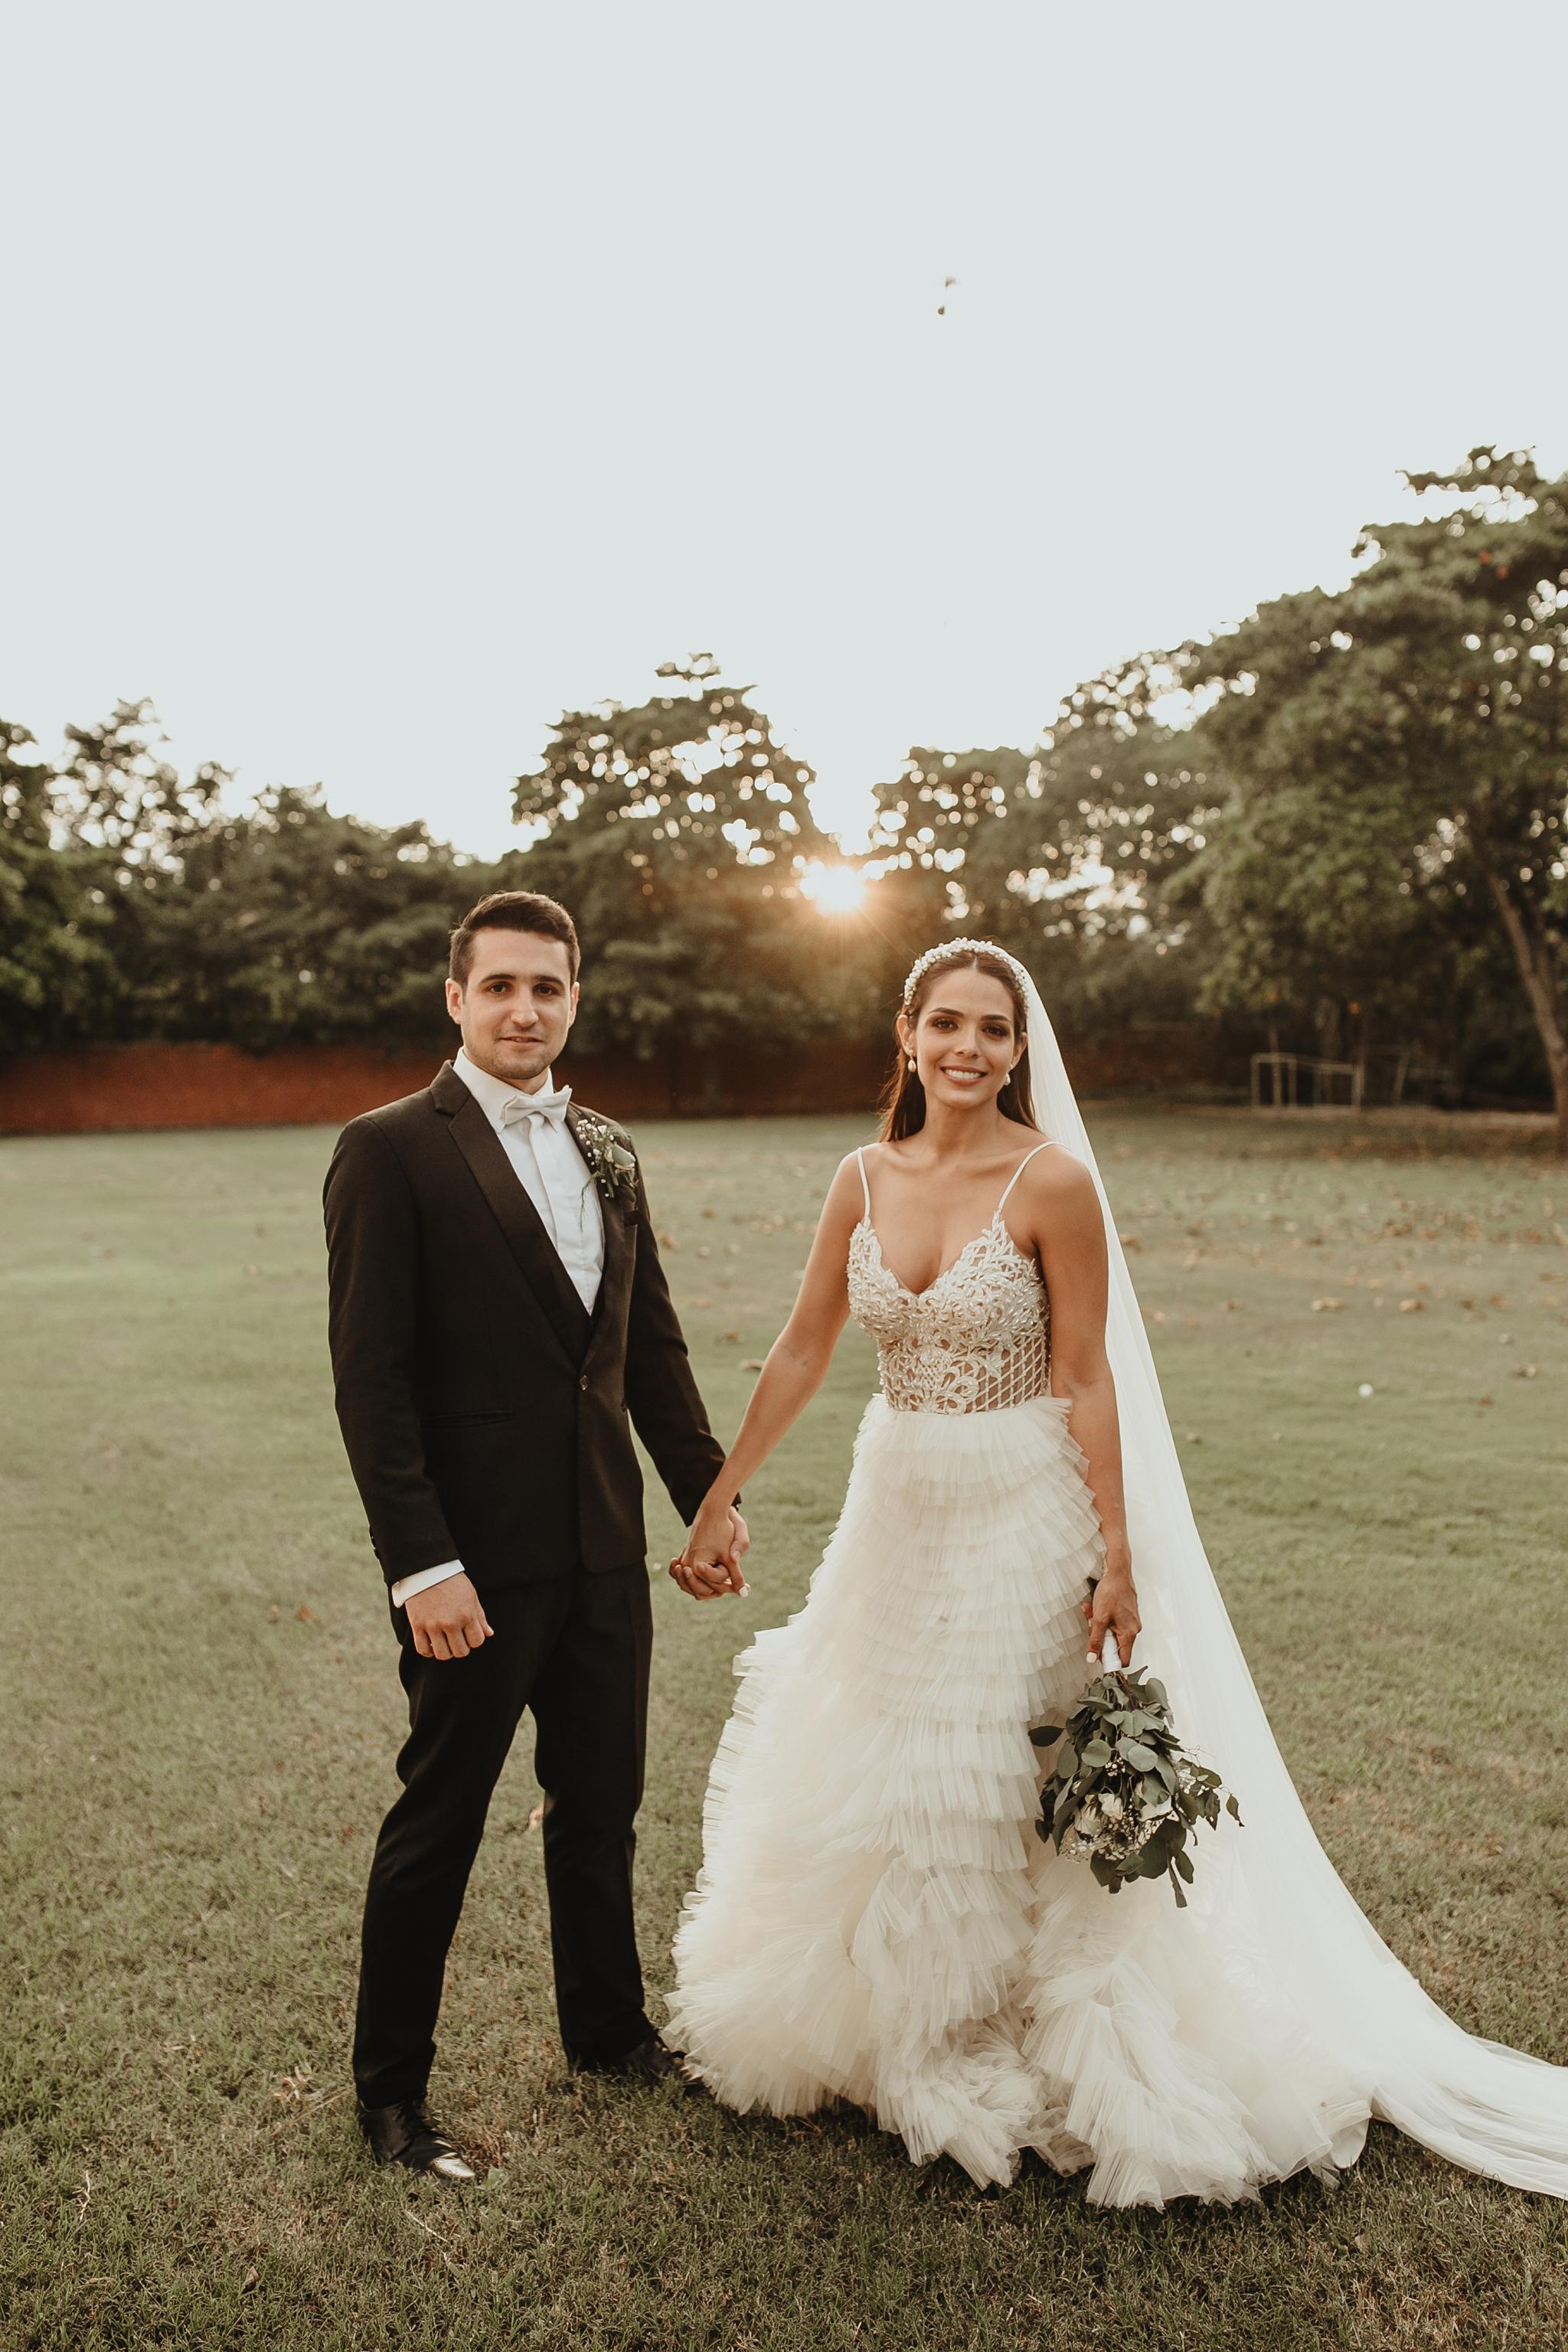 0831R&F__WeddingDestination_Weddingmerida_BodaMexico_FotografoDeBodas_FabrizioSimoneenFotografo.jpg